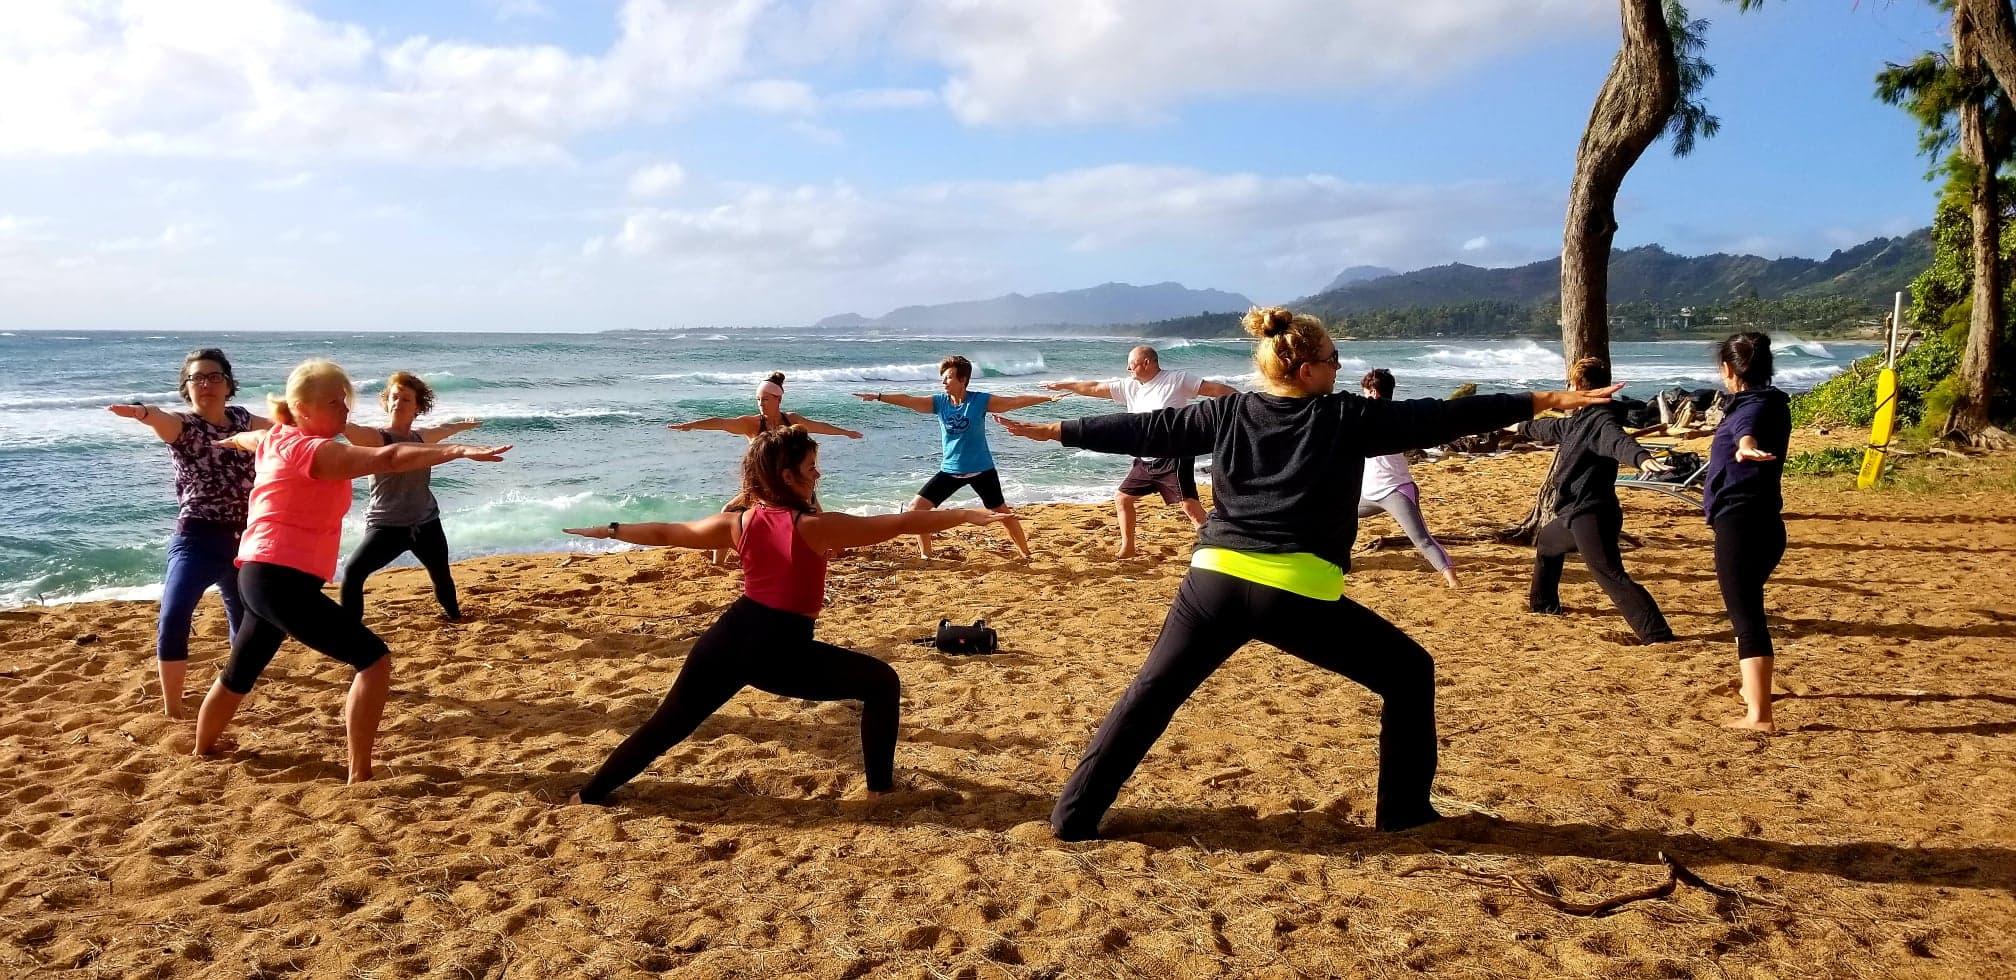 Kauai Yoga on the Beach - 420 Papaloa Rd, Kapaa, HI 96746On the beachfront of Kauai Shores Resort aside Lava Lava Beach Club | EVERYDAY @ 8:30-9:45amSAMSATI's Hatha Flow | Wednesday & Saturday$20 cash in person | $10 kamaʻāina